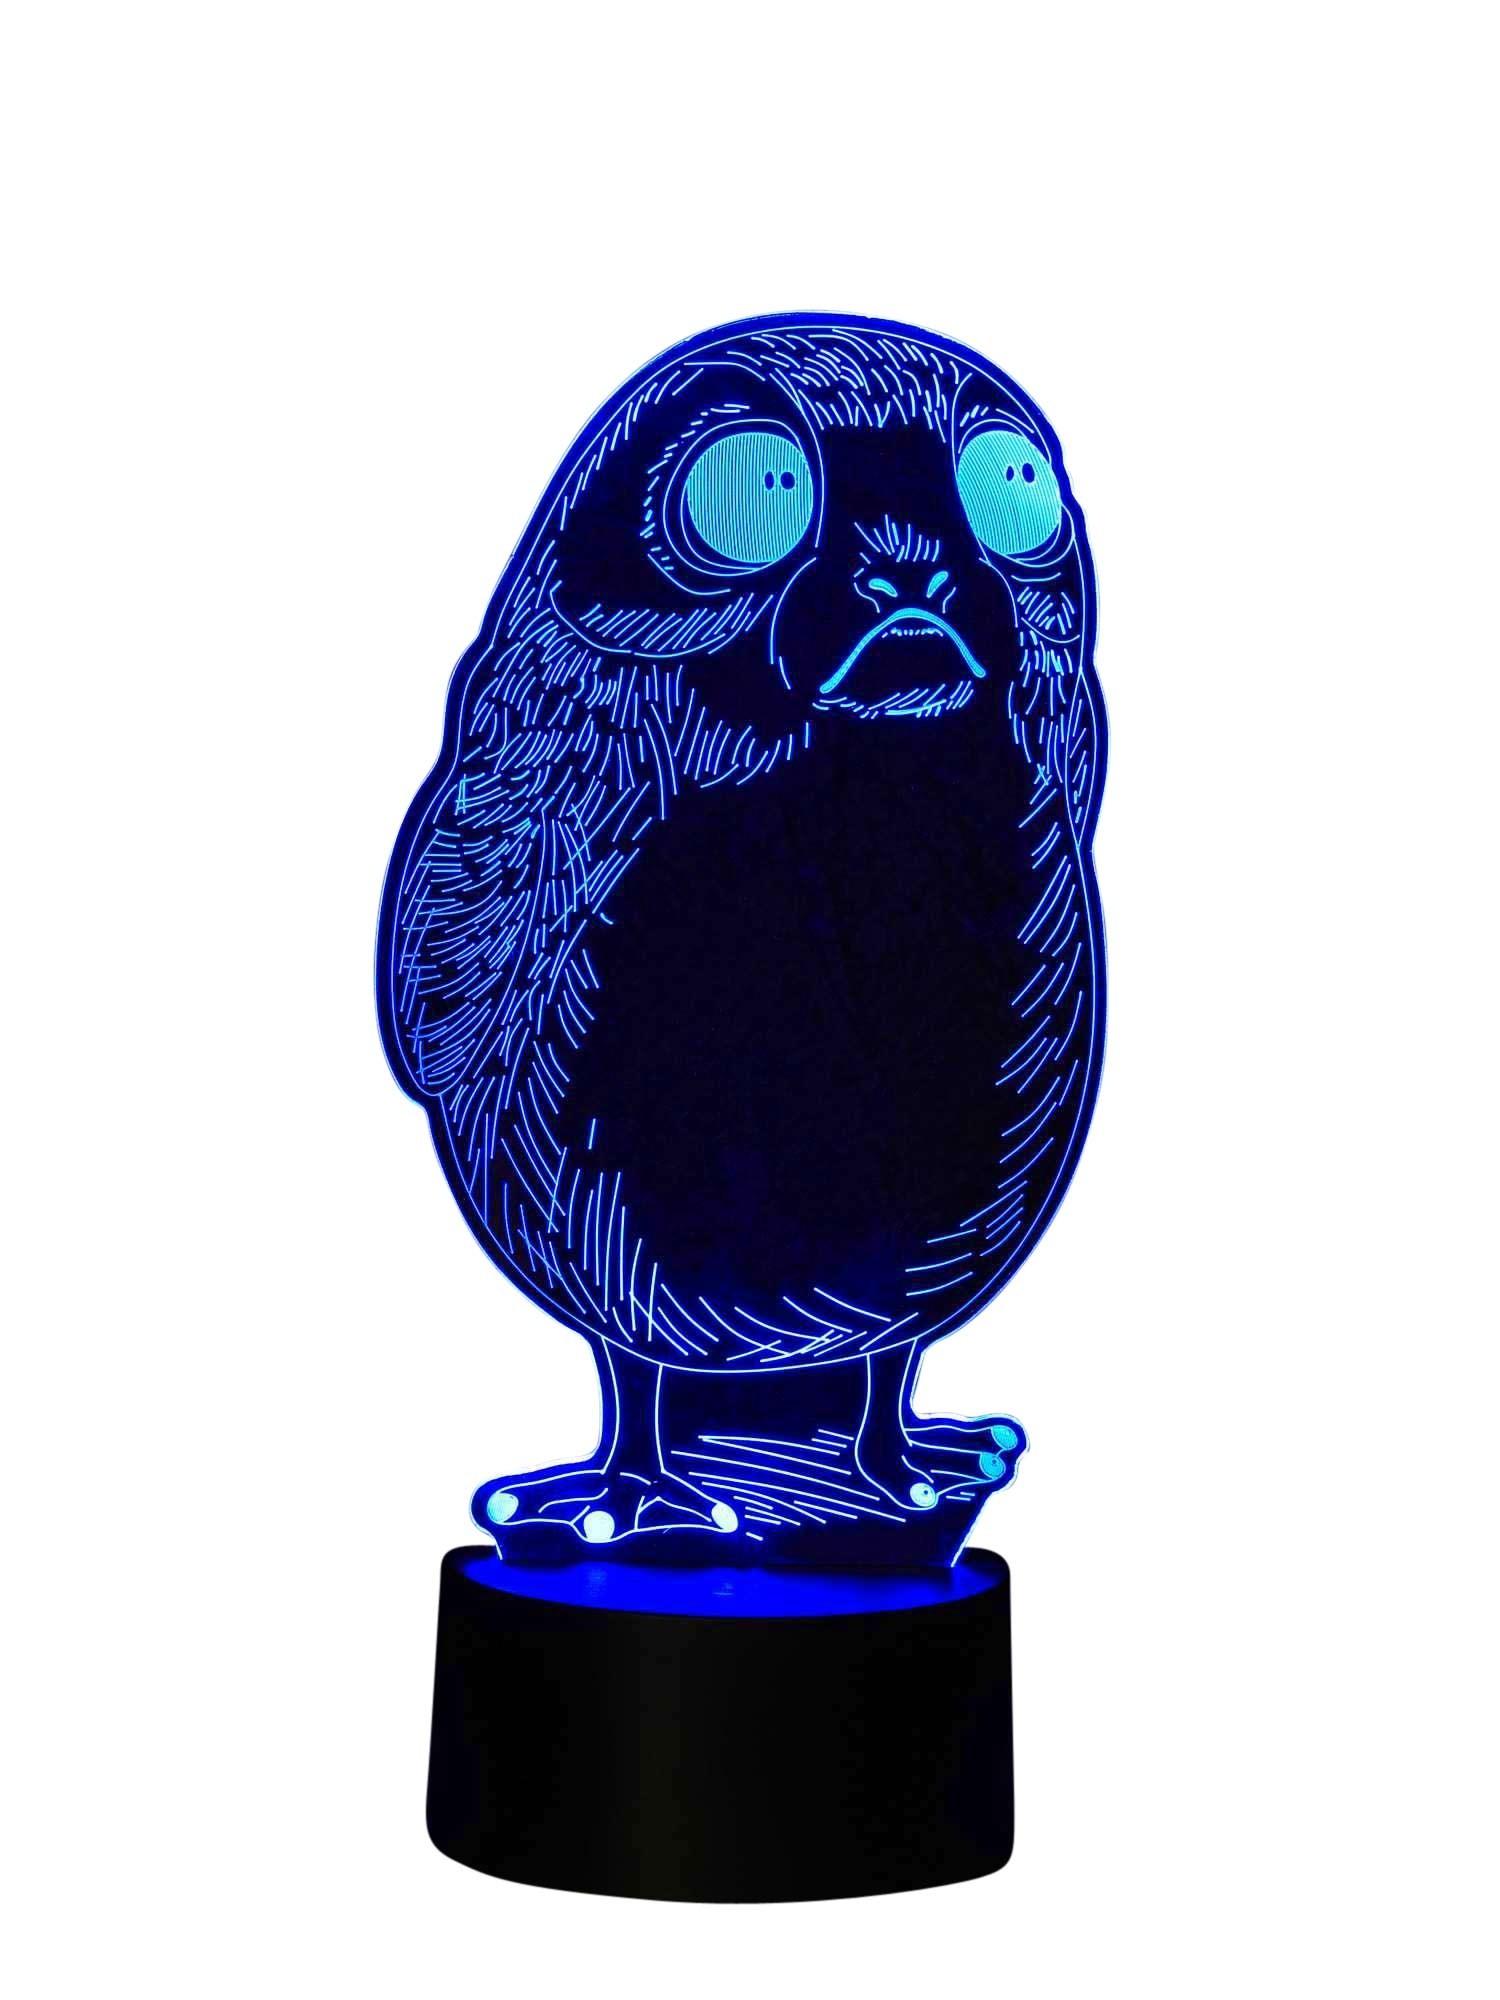 3D LED-Lampe Science Fiction Raumschiff Tischlampe Nachtlicht Nachttischlampe Wohnlicht Tischleuchte Farbwechsel Show-Effekt